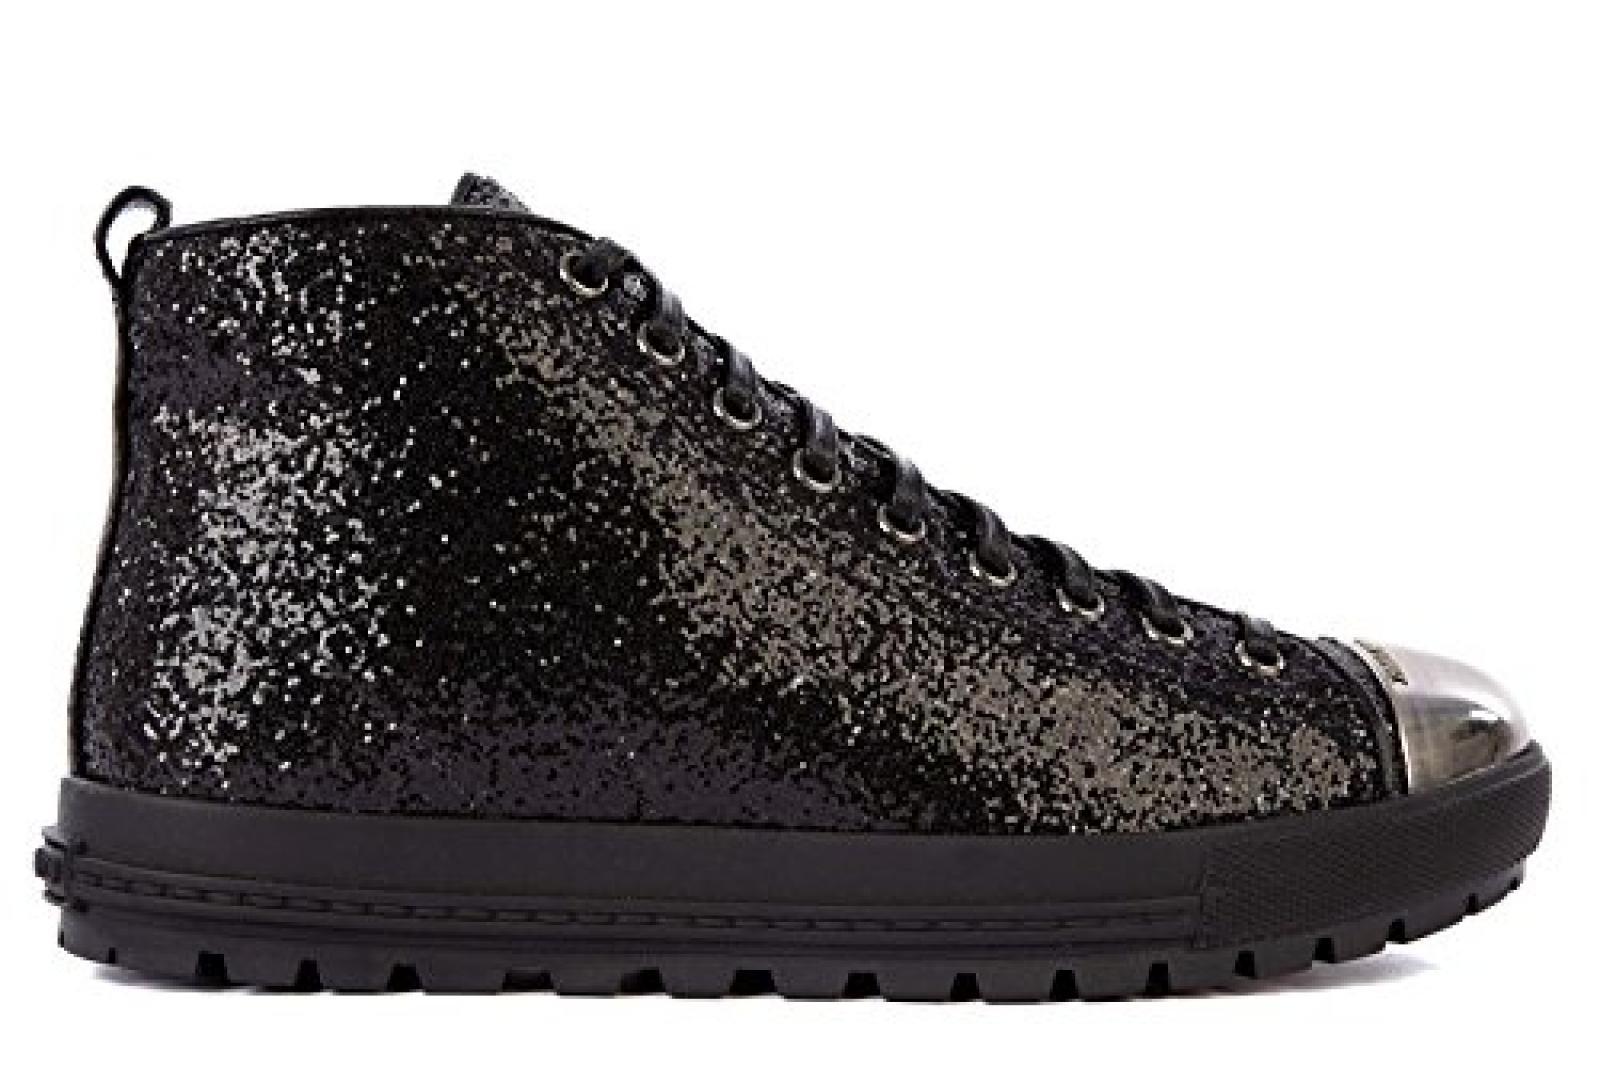 Miu Miu Damenschuhe Damen Leder Schuhe High Sneakers Schwarz